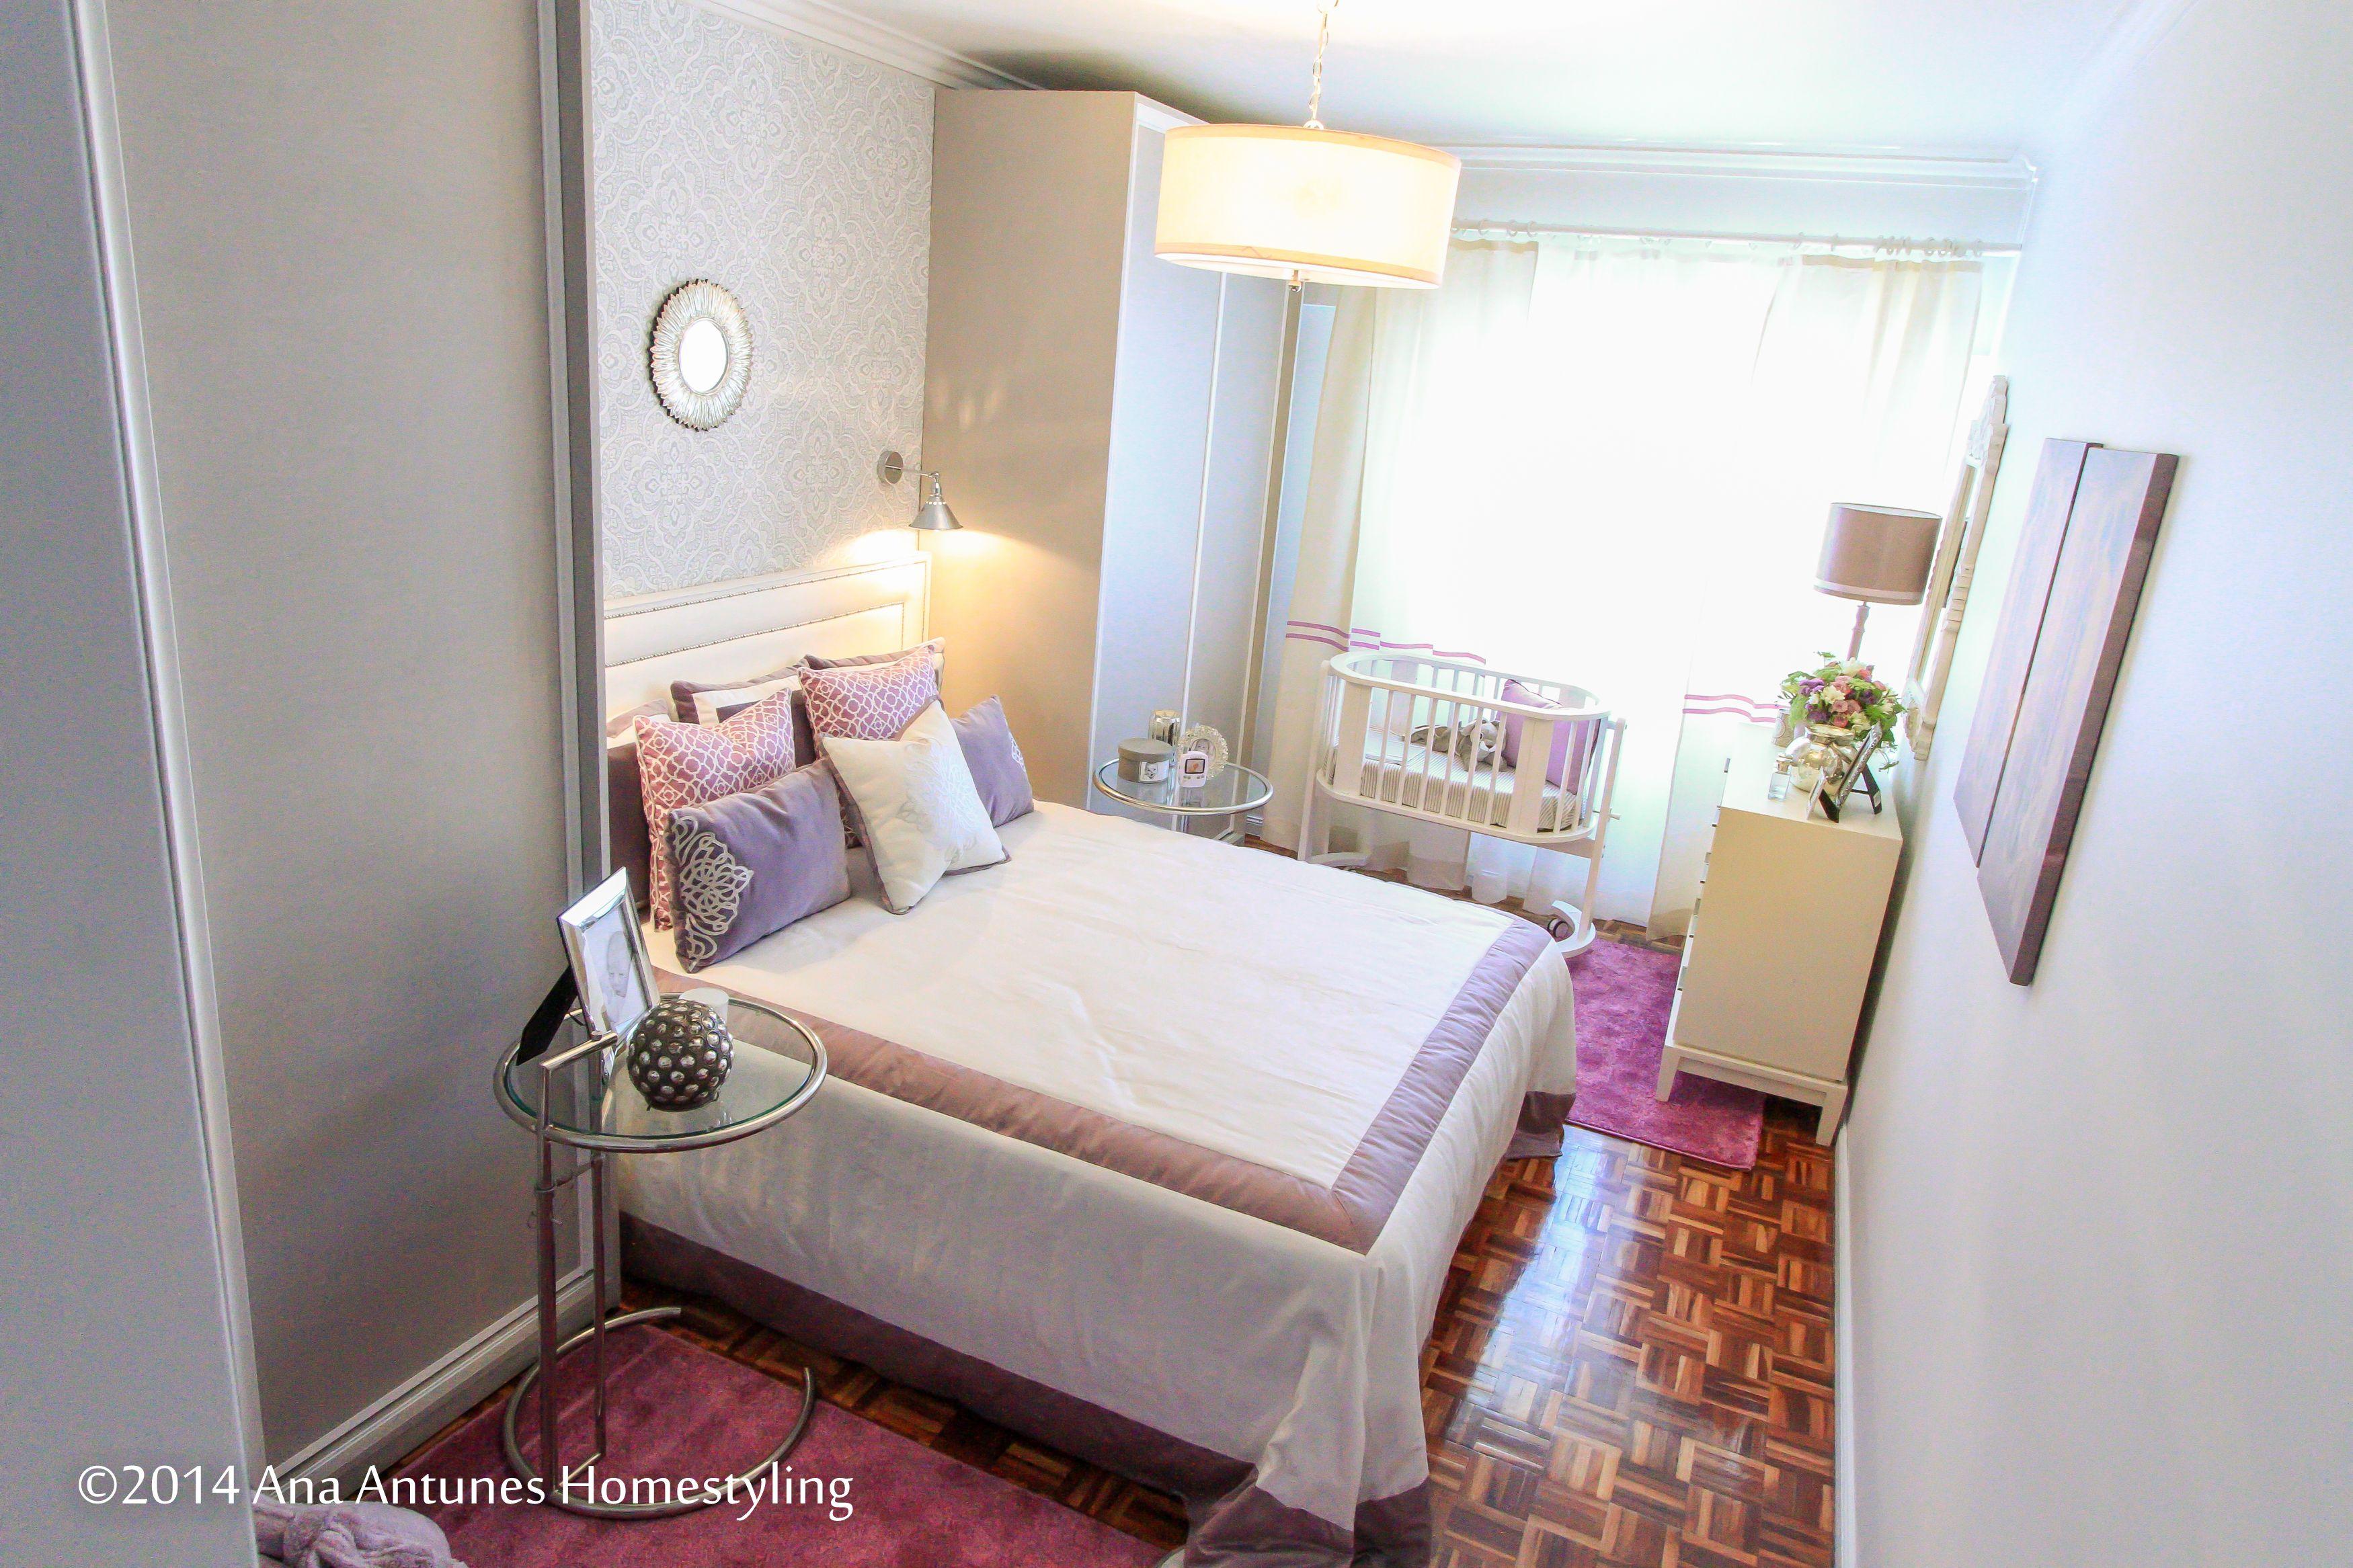 Ana Antunes Quarto Bedroom Cama De Casal Double Bed  ~ Quarto De Bebe Unisex Simples E Lustres Para Quarto Casal